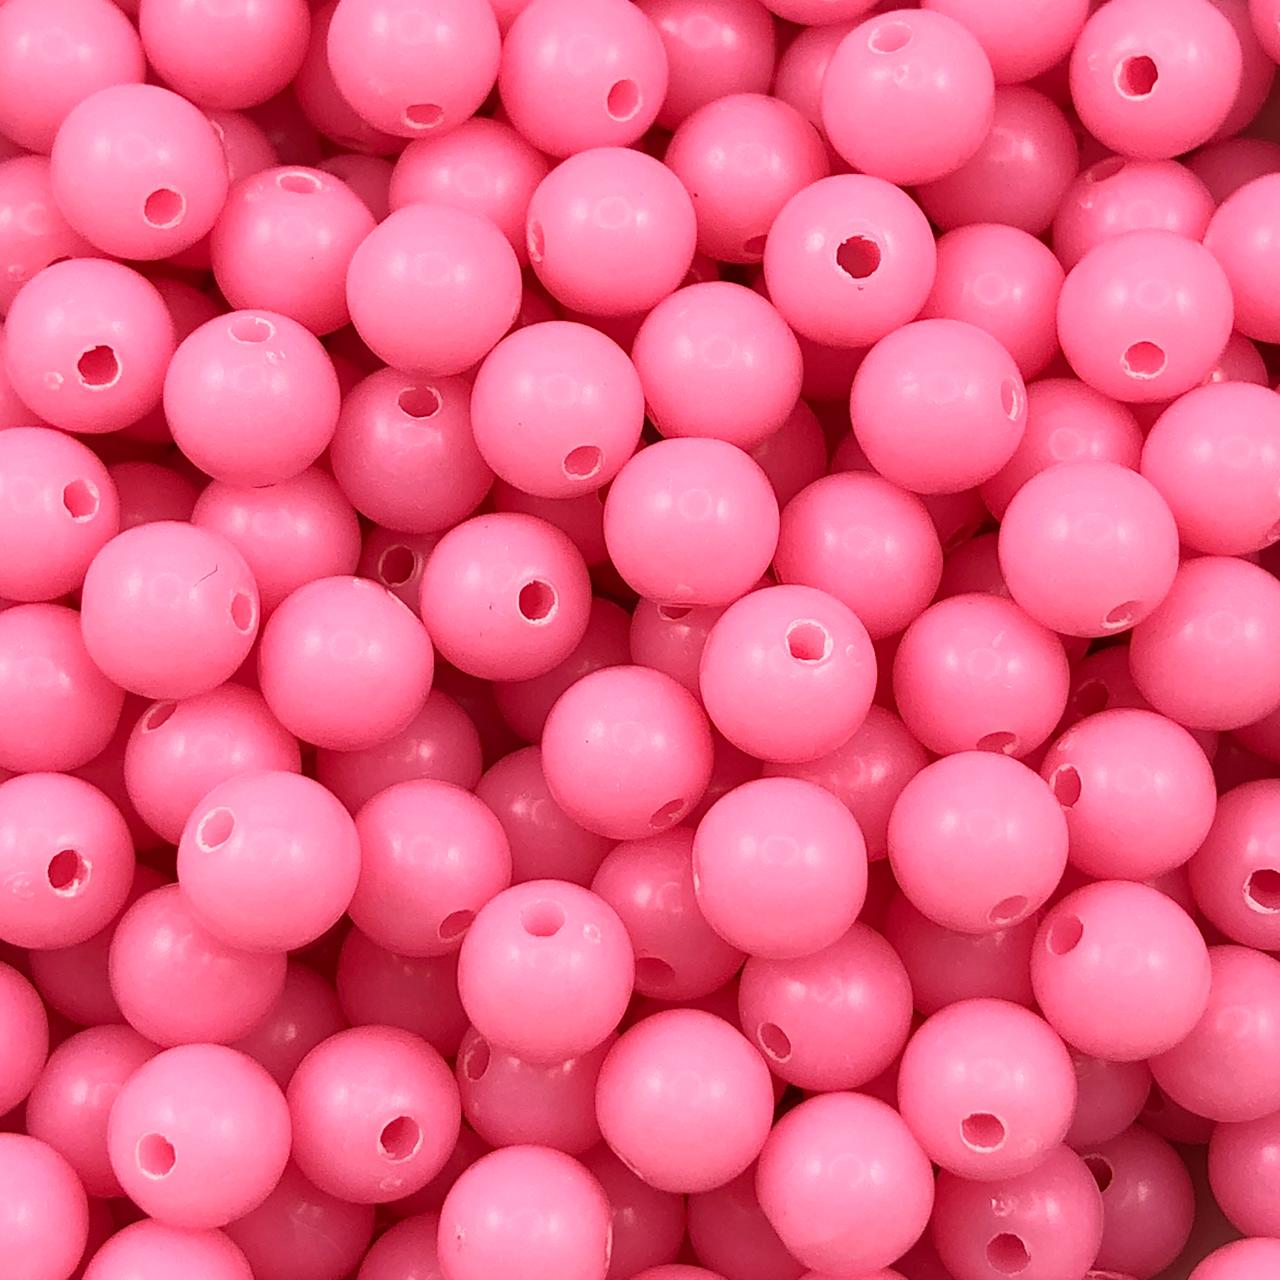 BOL652 - Bola Plástica Rosa Chiclete 8mm - 20Grs